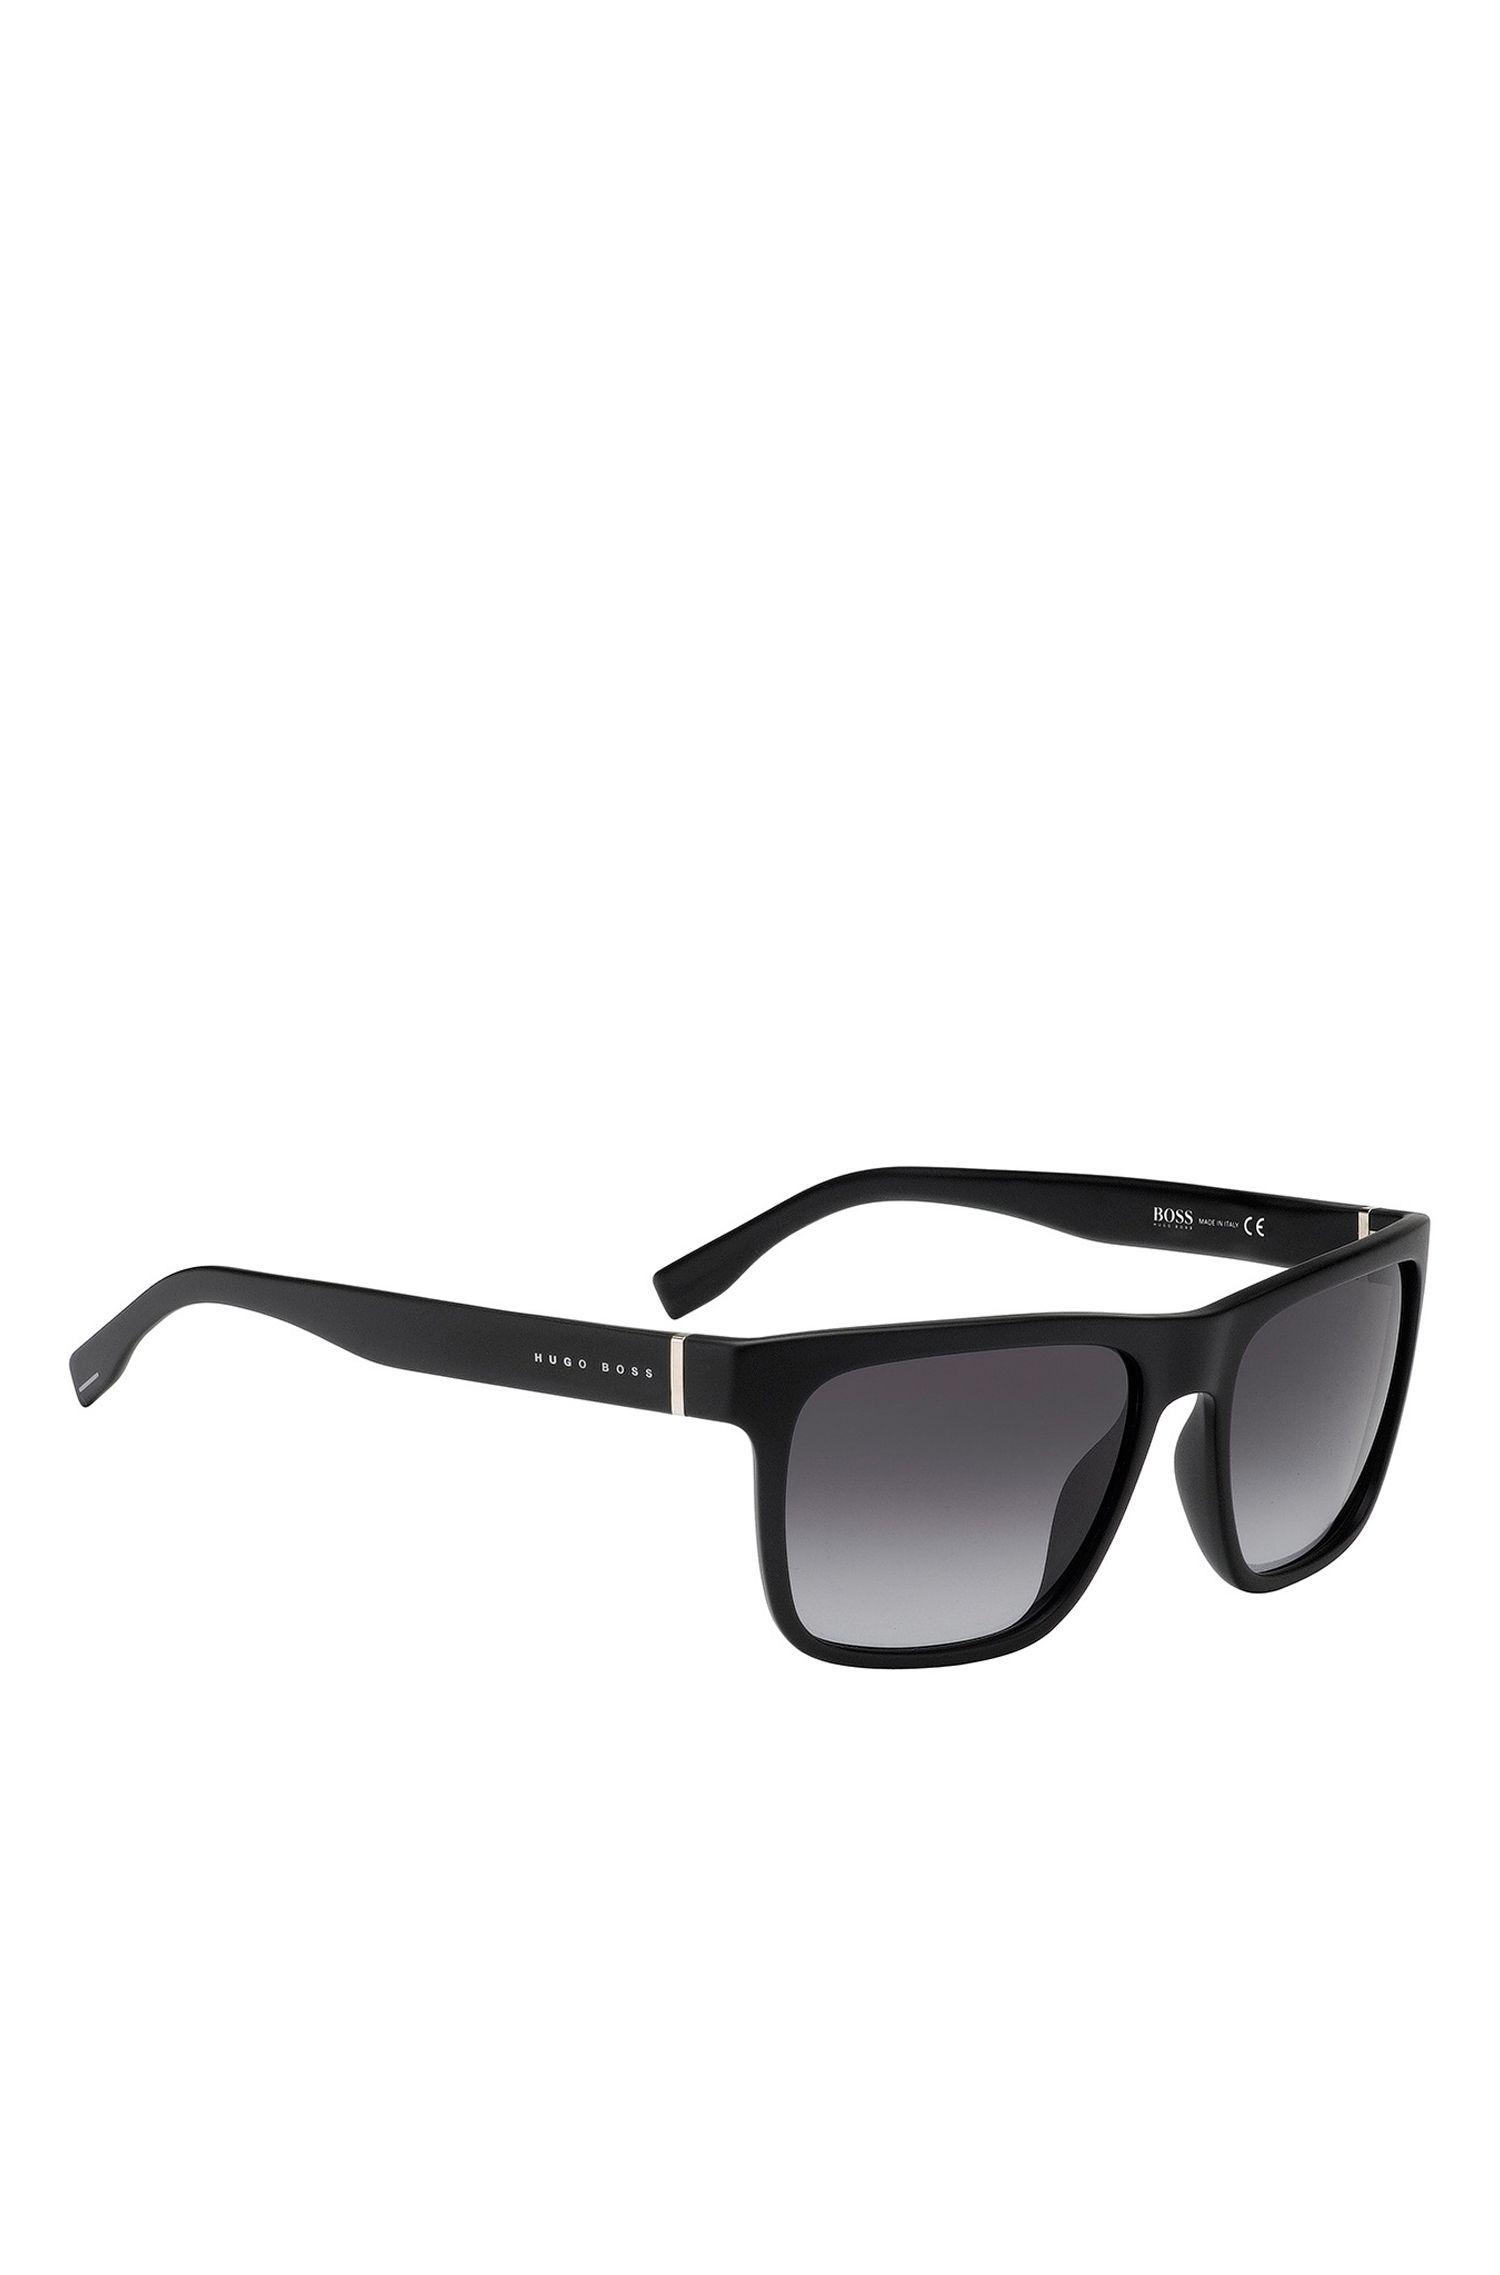 'BOSS 0727'   Shaded Lens Regtangular Optyl Sunglasses